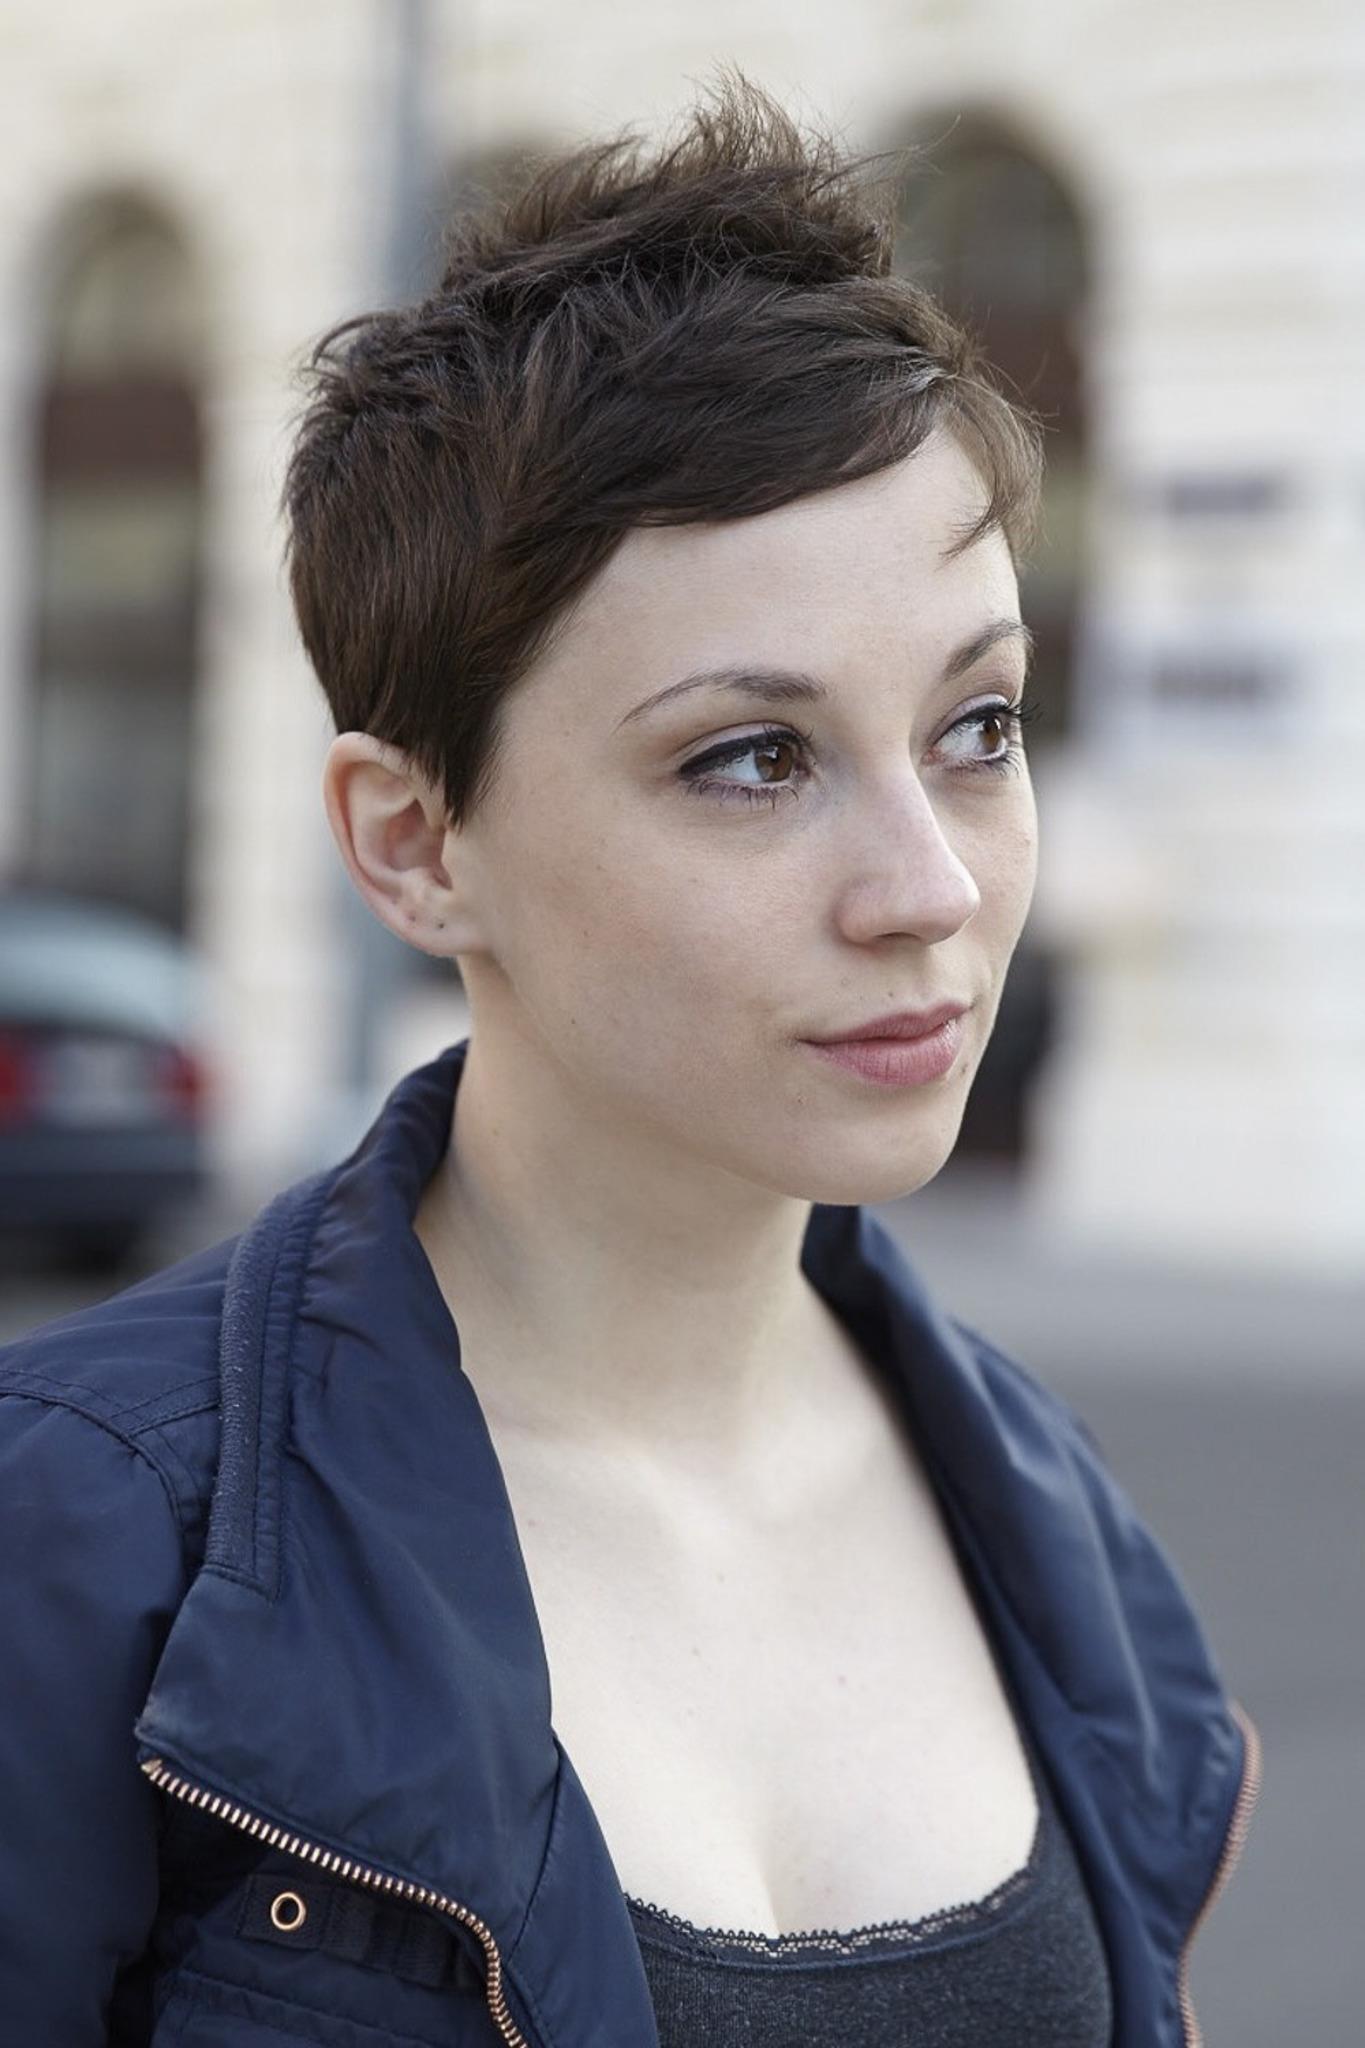 Tanja Raunig